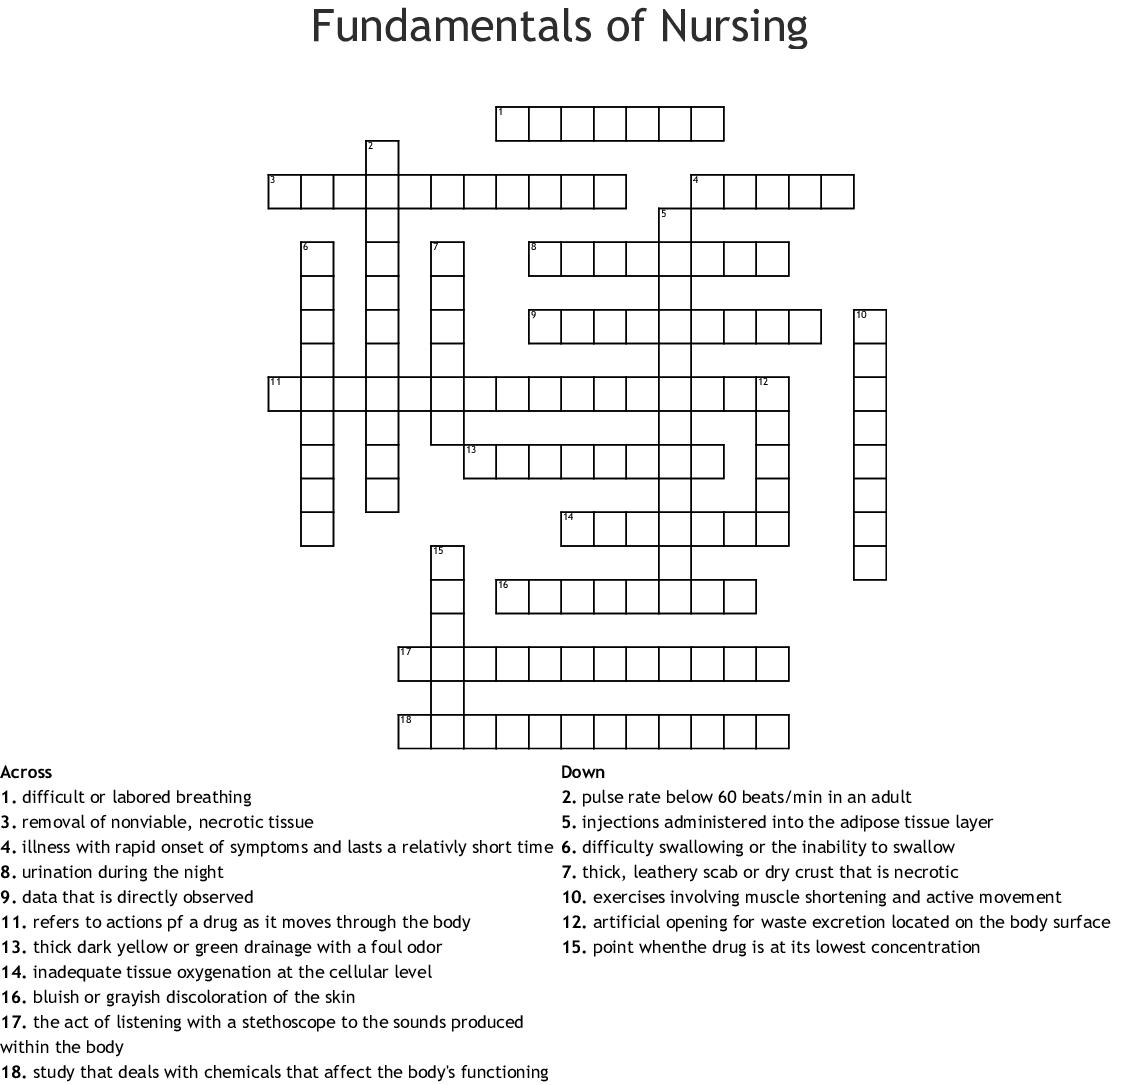 Fundamentals Of Nursing Crossword - Wordmint - Nursing Crossword Puzzles Printable